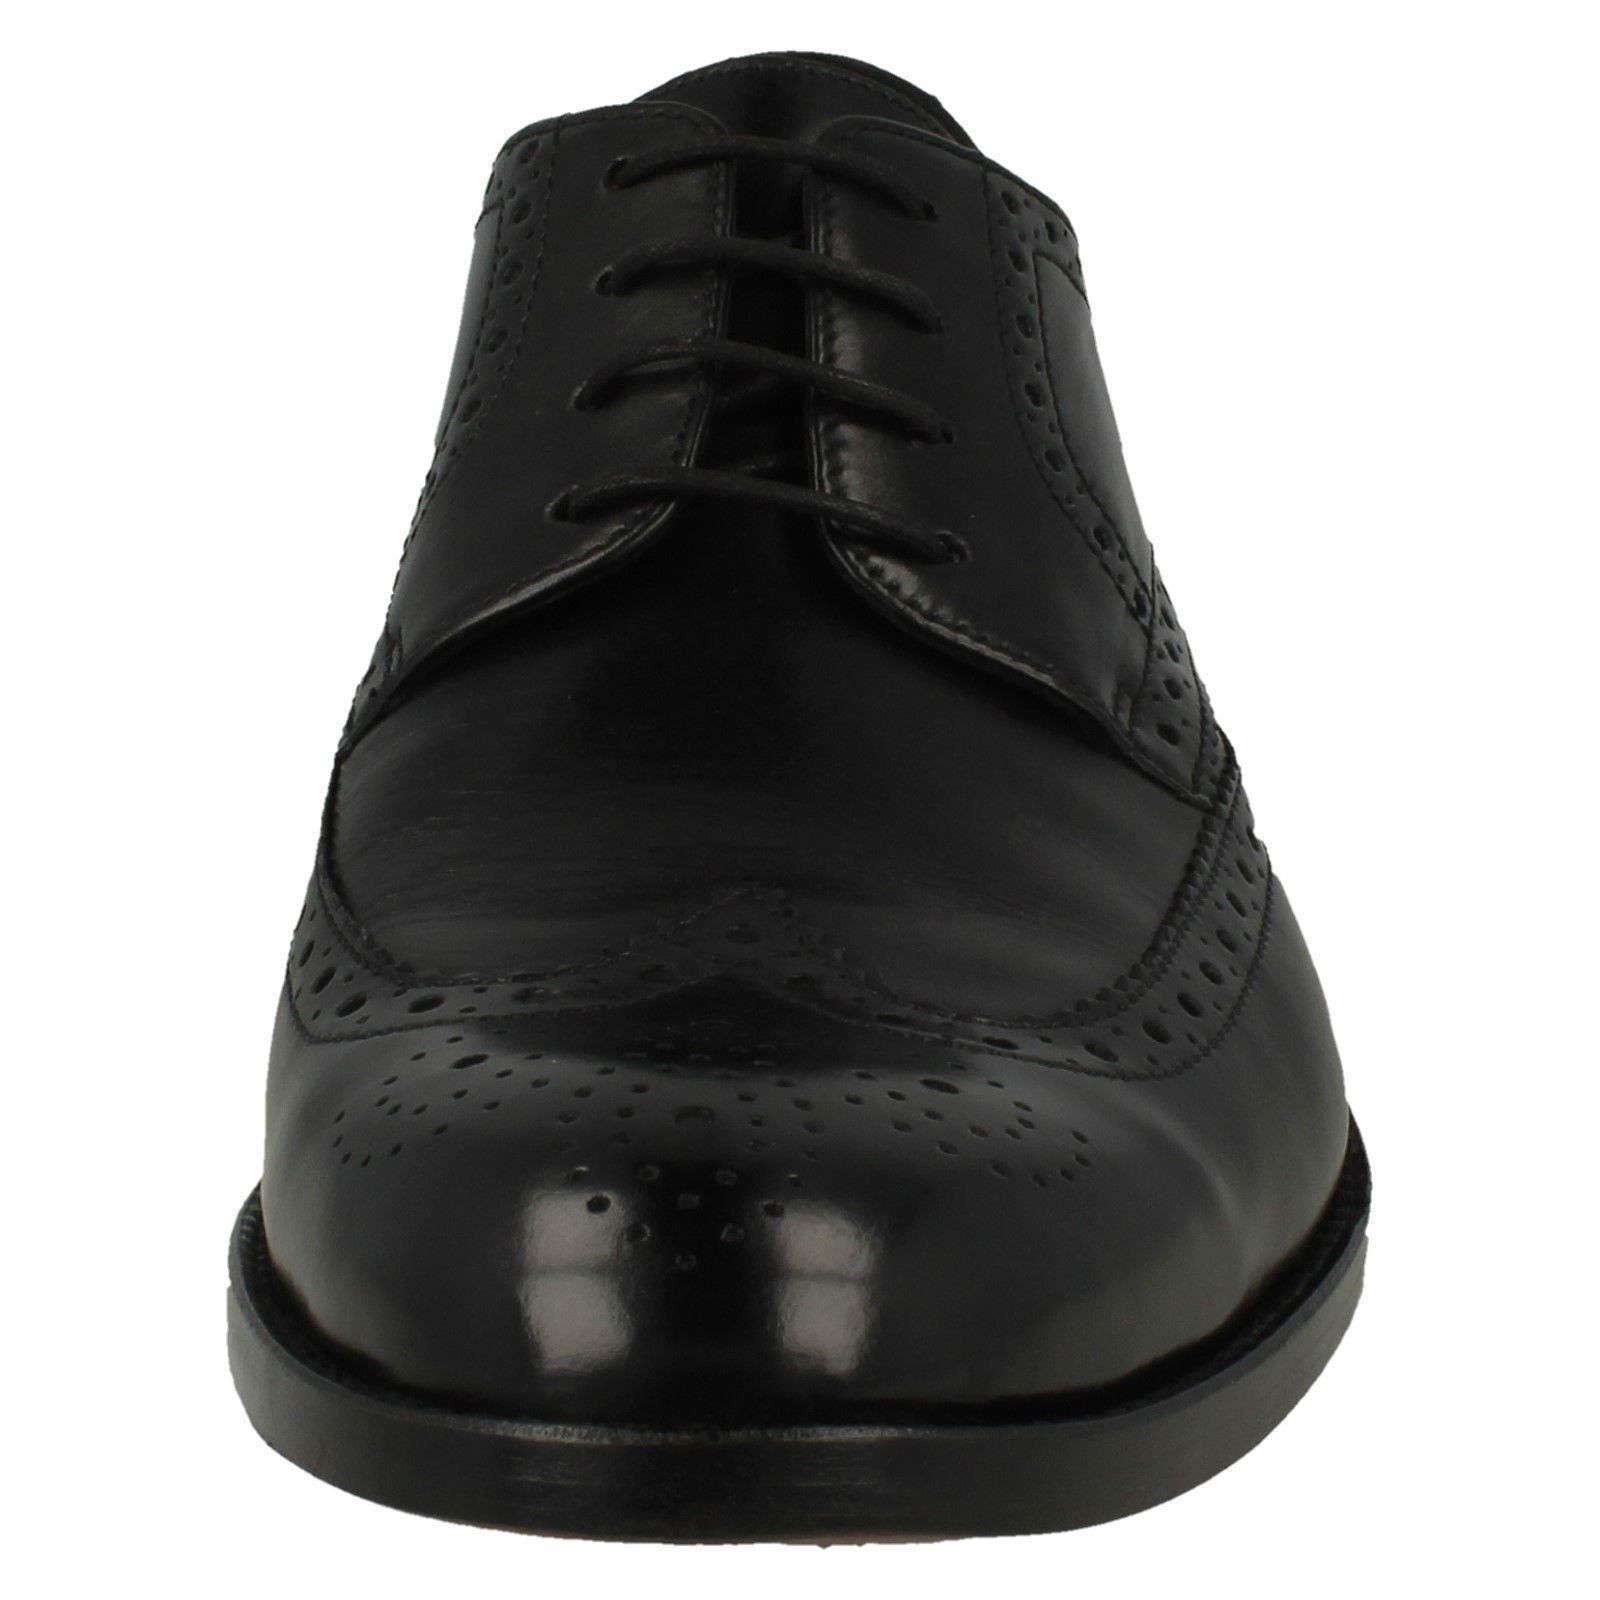 Con Zapatos Formal Detalle James Wing Clarks Brogue Hombre wvqt6x